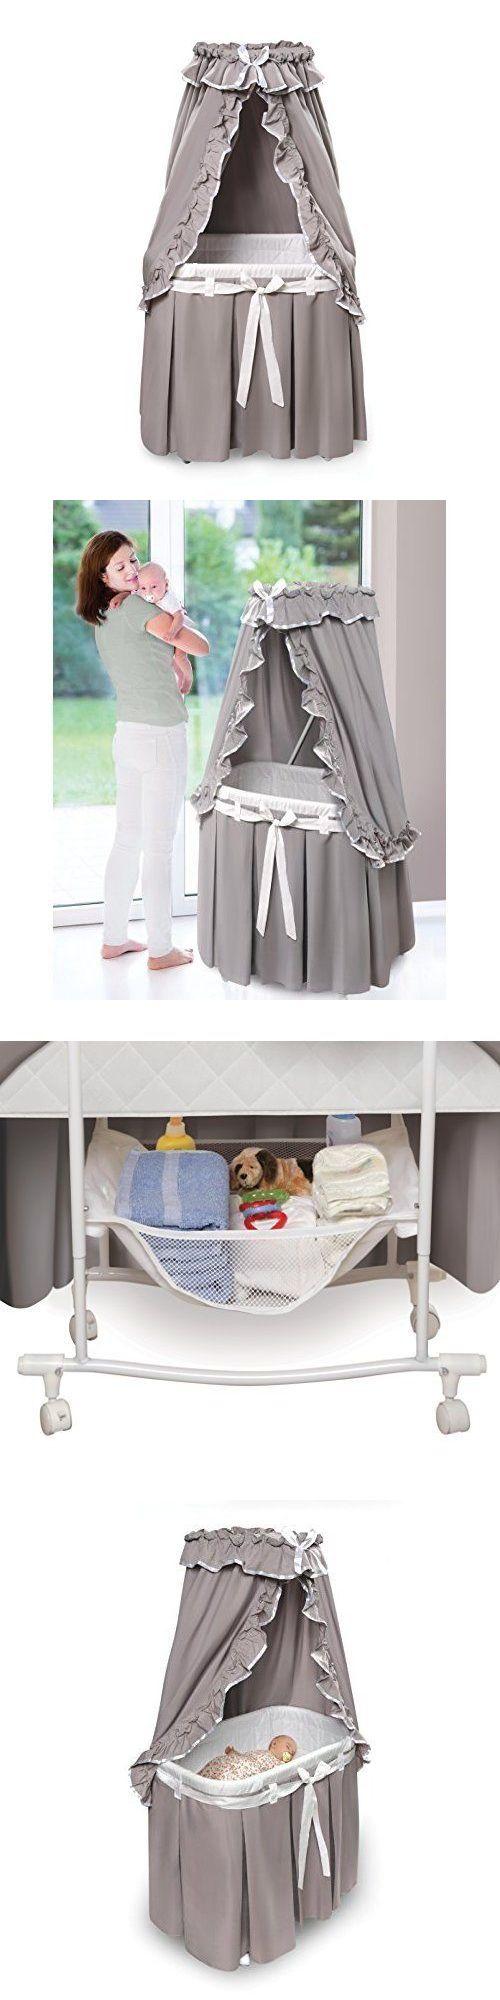 Baby bed ebay india - Baby Nursery Infant Newborn Baby Bassinet Crib Bed Canopy Modern Bedding Nursery Gray White